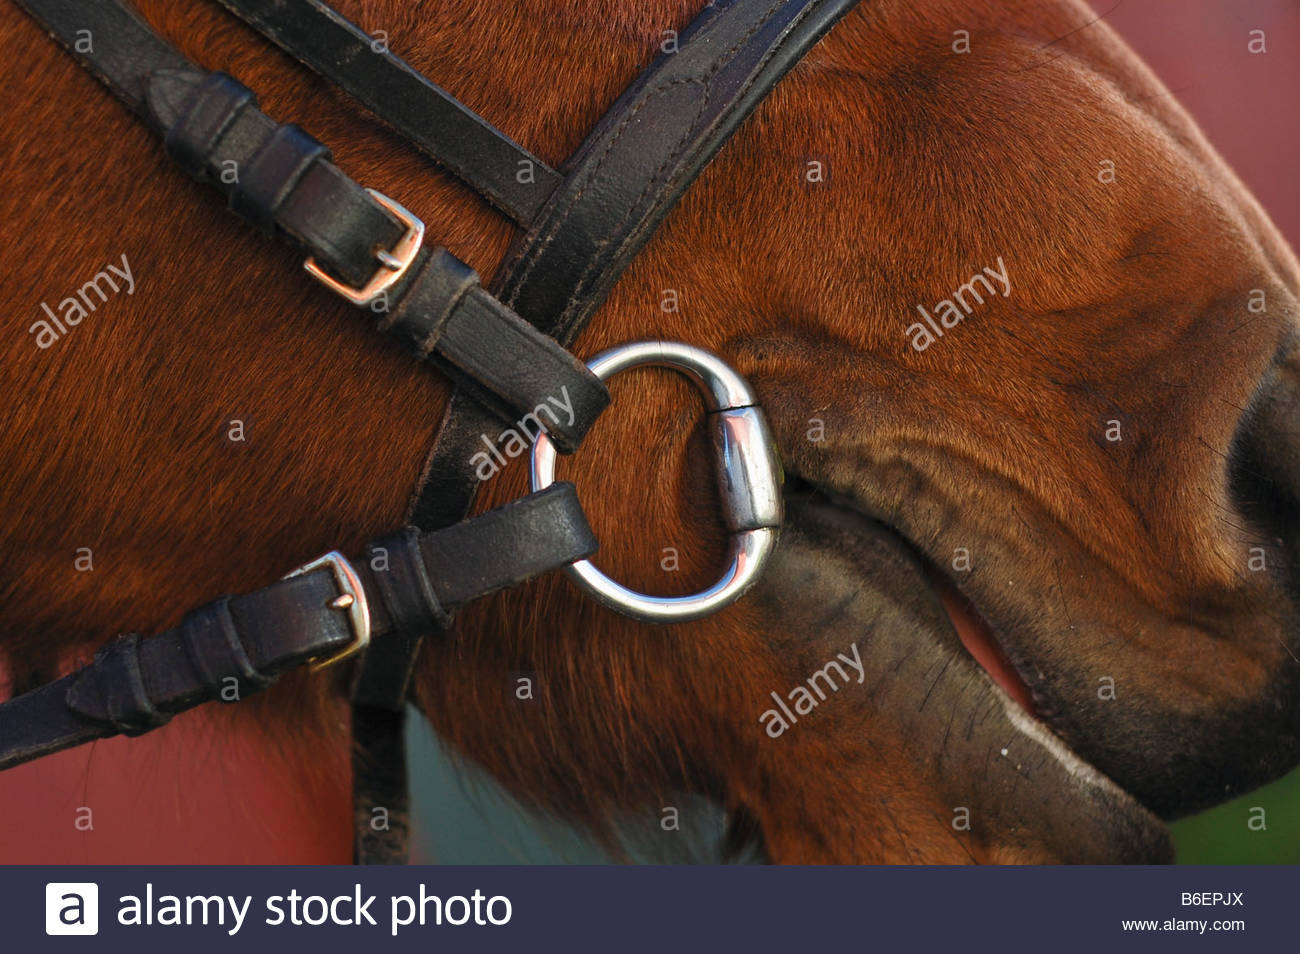 Horse bridle - Stock Image